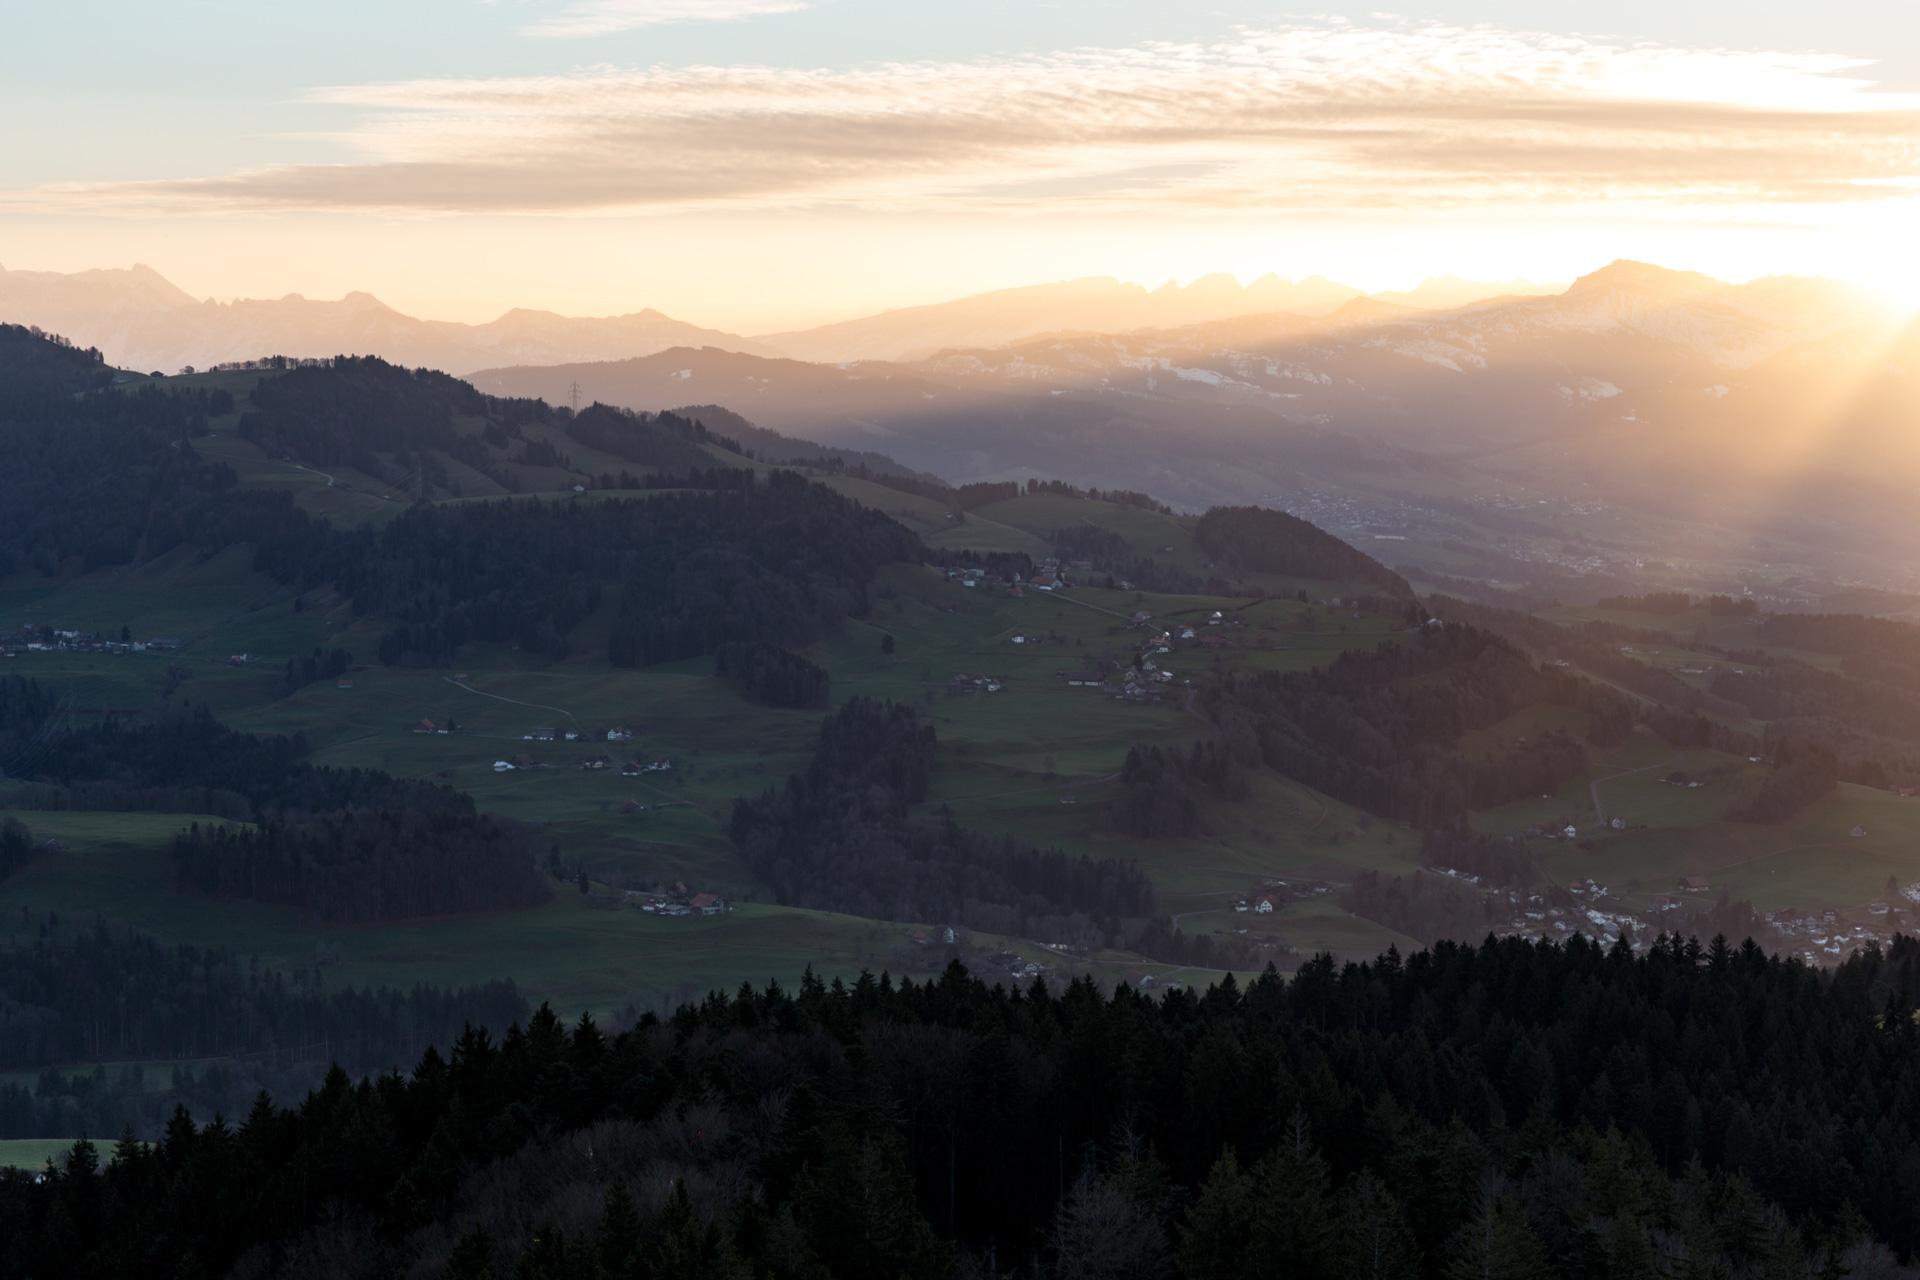 Sonnenaufgang-Bachtelturm_20151219_5970-1